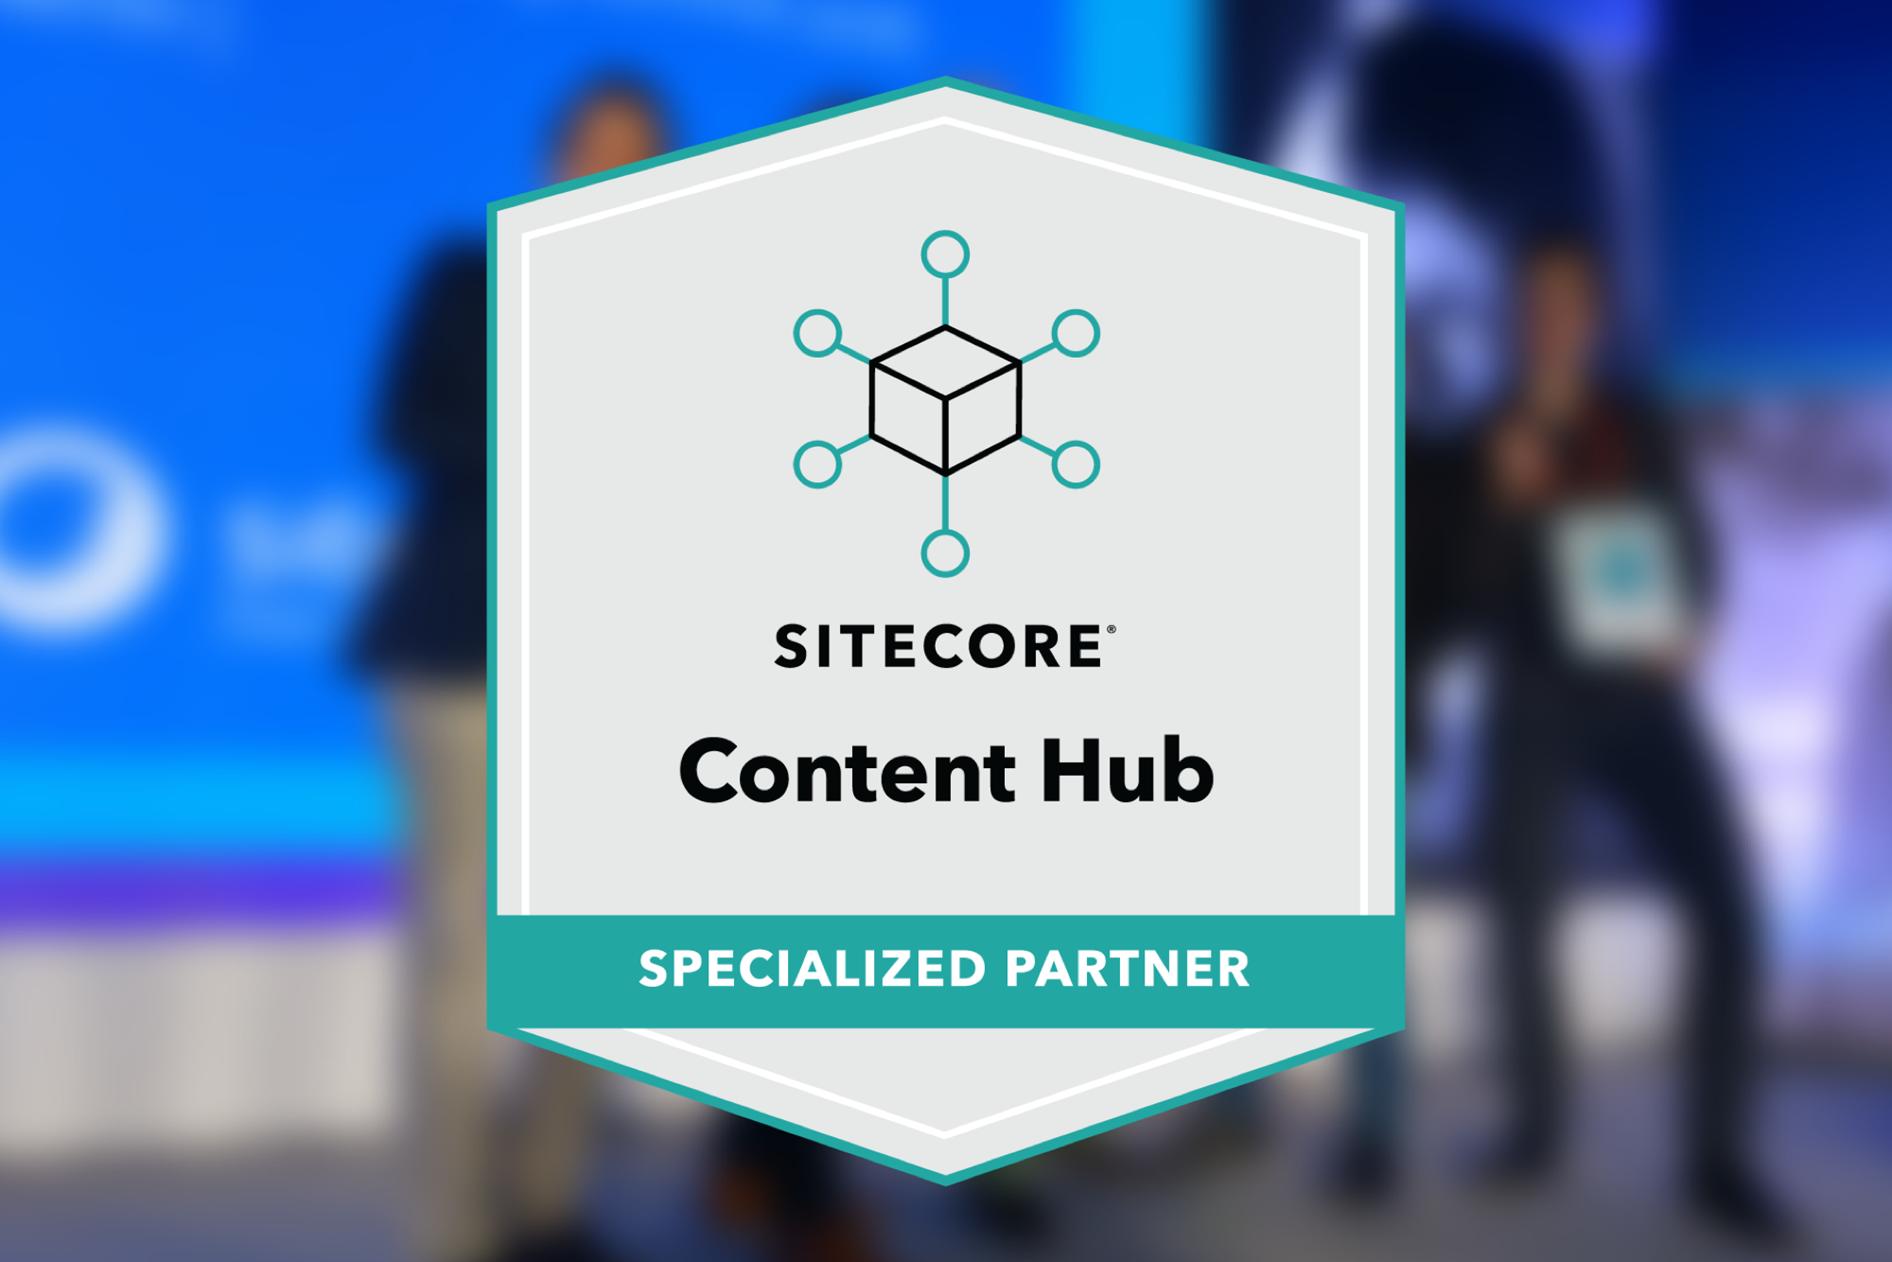 Sitecore Content Hub Specialized Partner